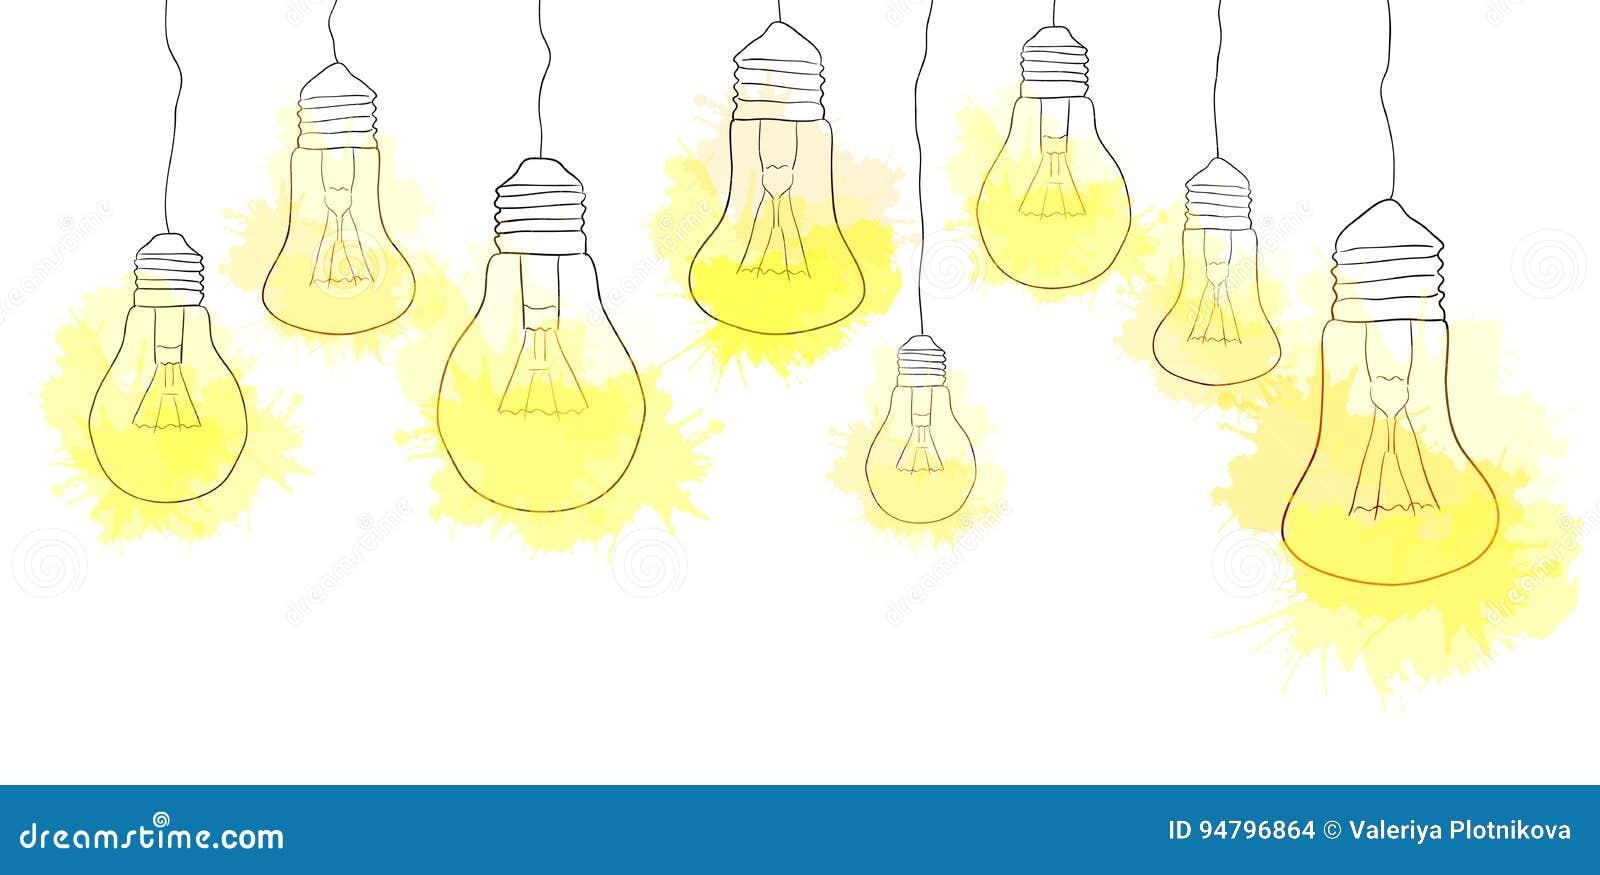 linear illustration of hanging light bulbs stock vector